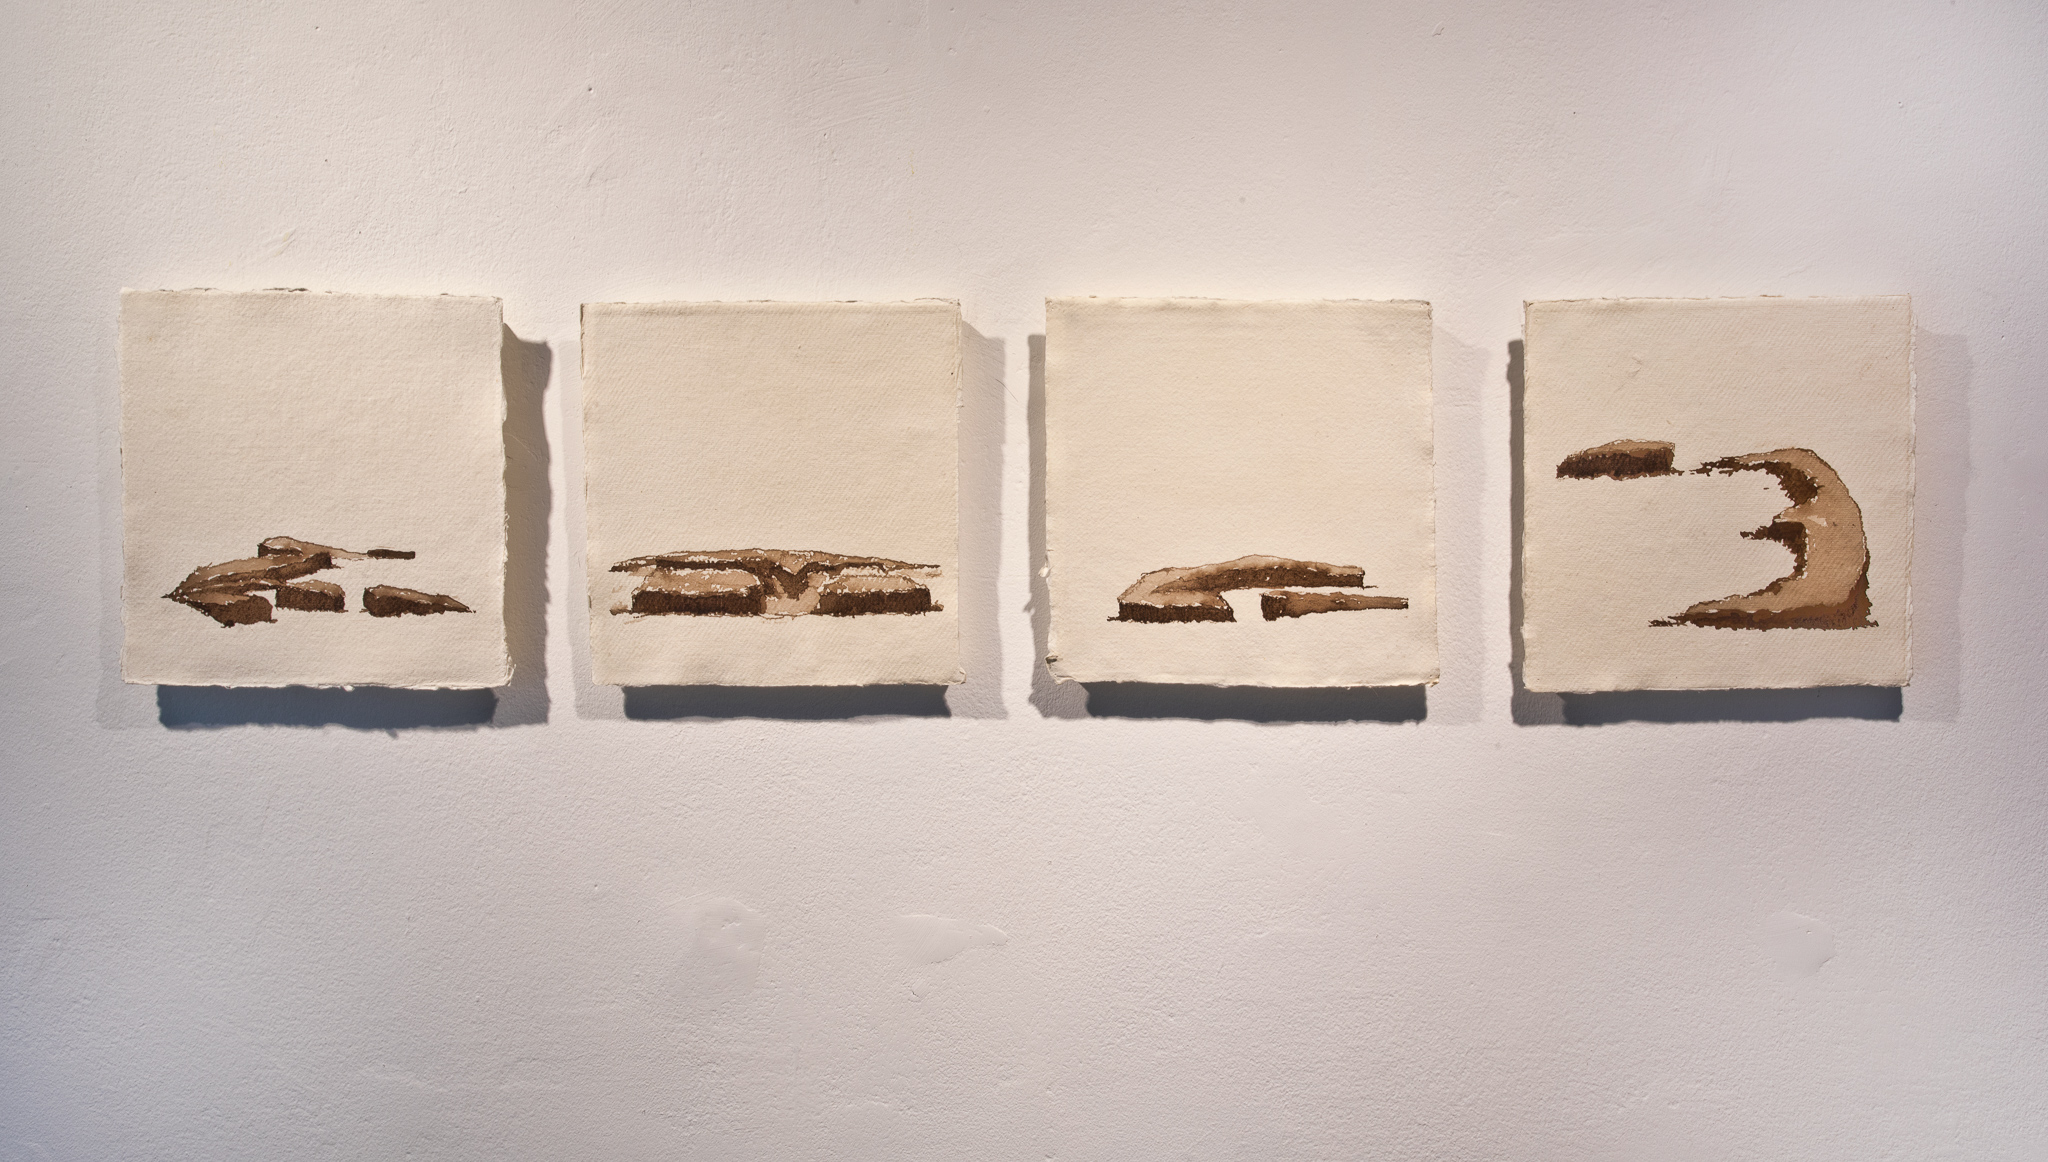 Maria Levinge, Bog cuttings 1-4, 2020 - oak gall on paper on board, 21.5x20cm - €300